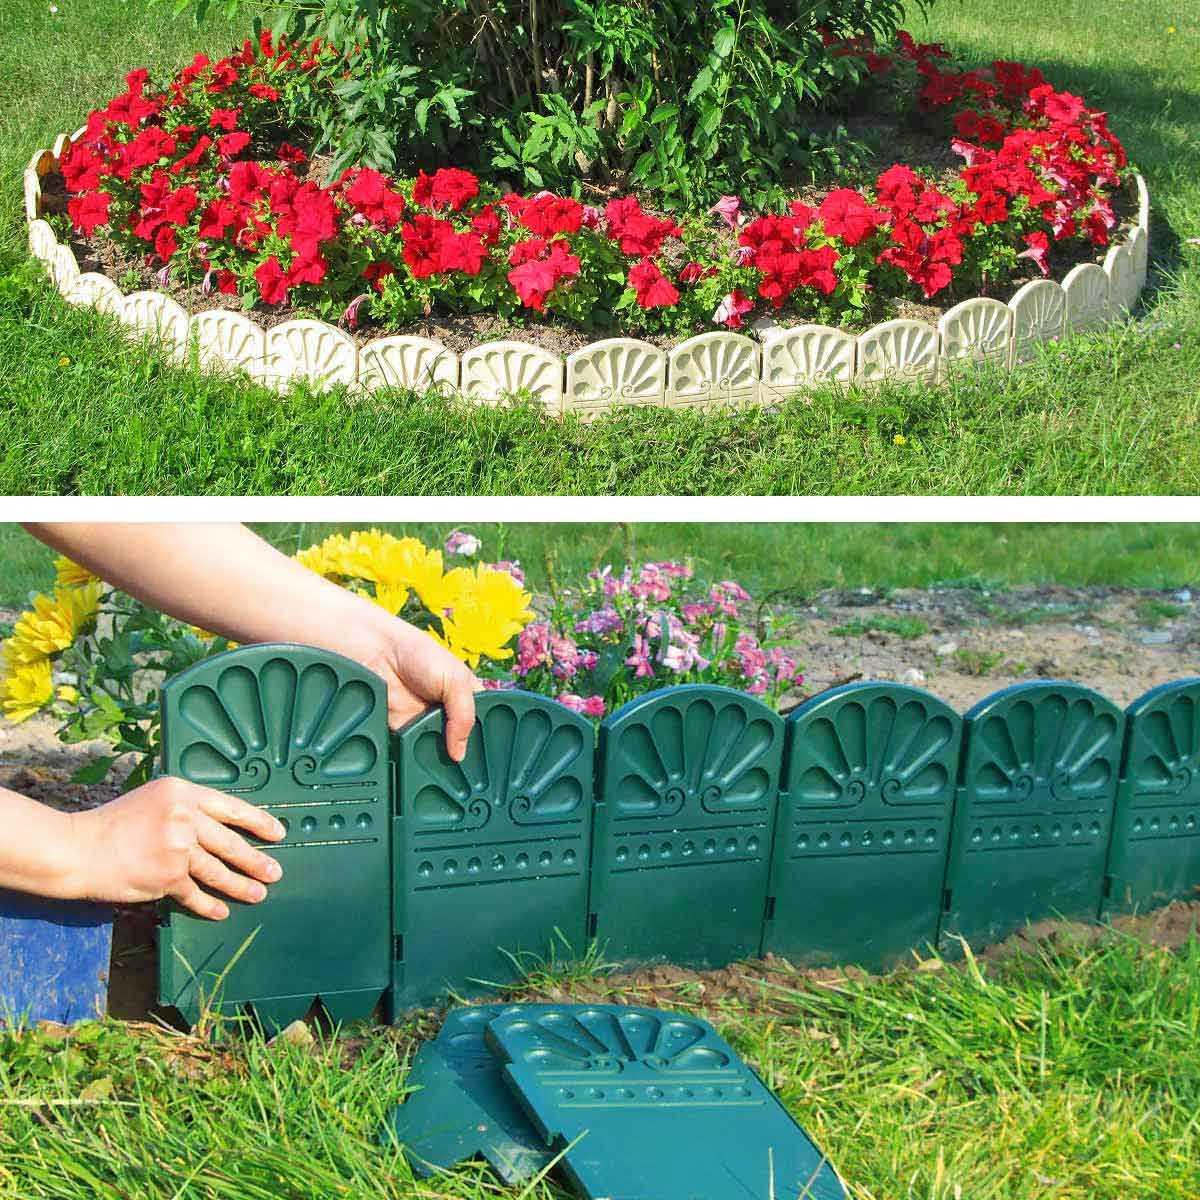 Bordures décoratives de jardin en plastique - Bordure de Jardin